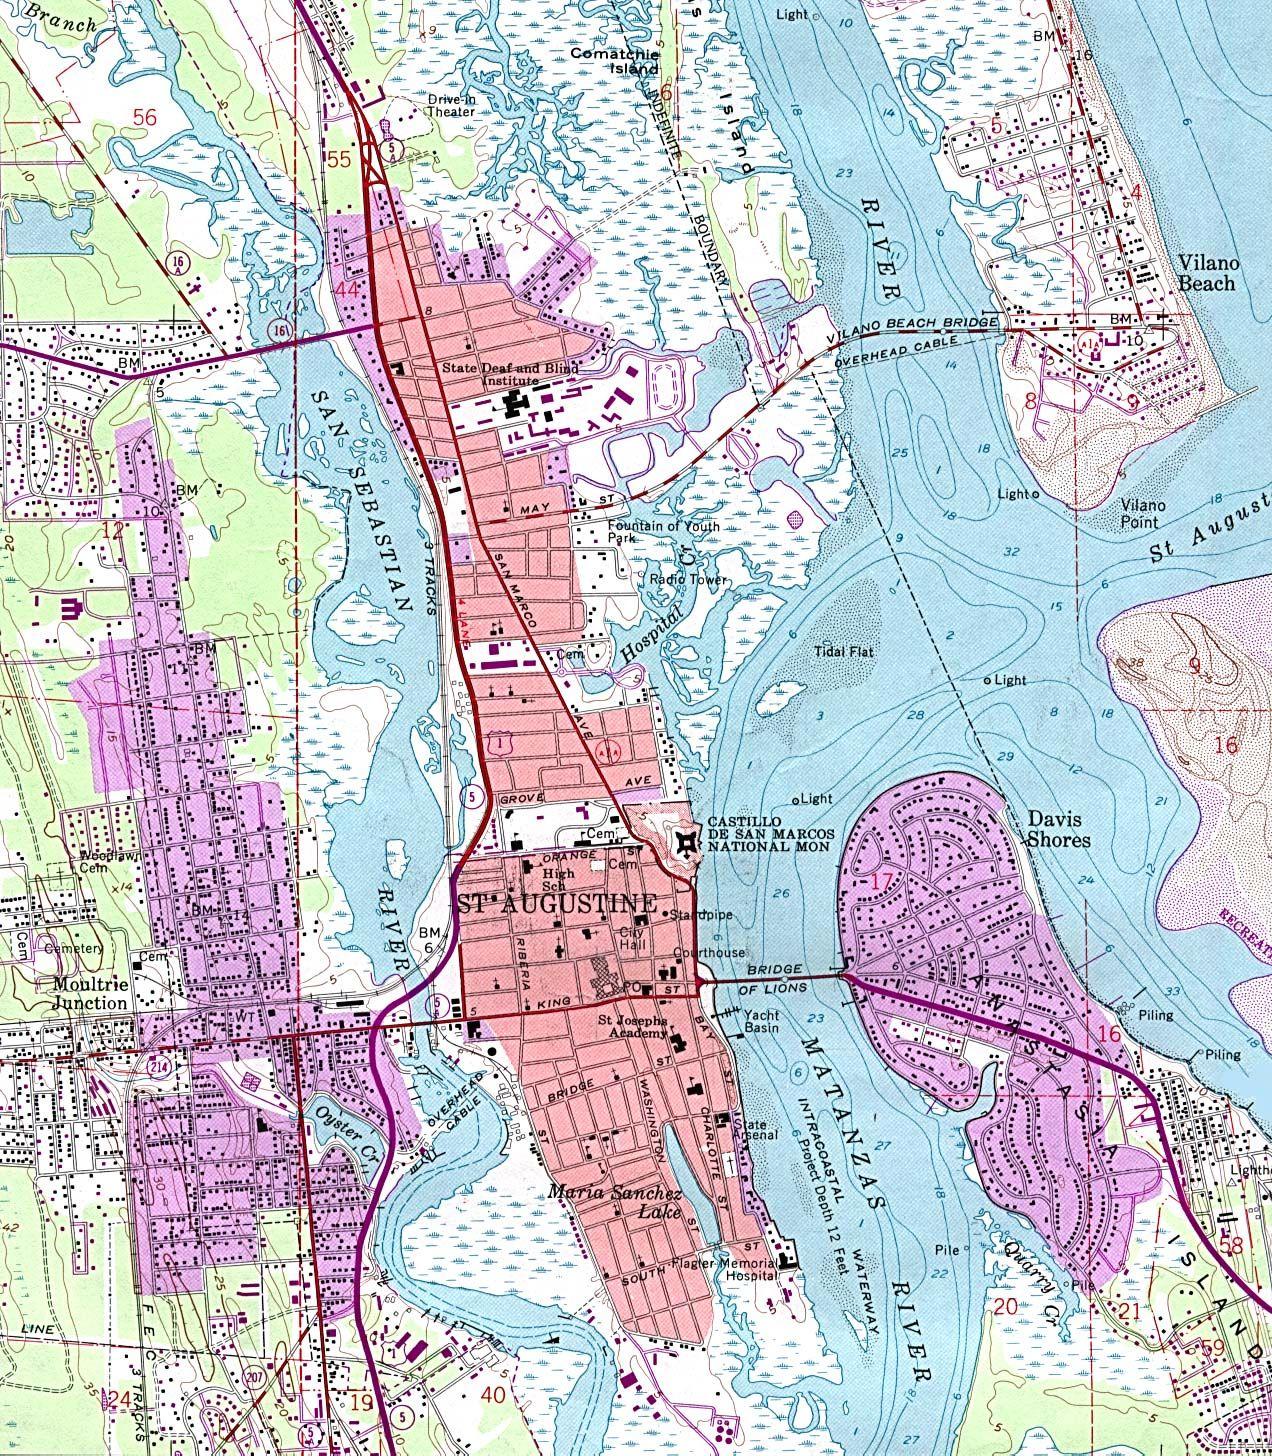 St Augustine Florida | St. Augustine, Florida History | Florida - St Augustine Florida Map